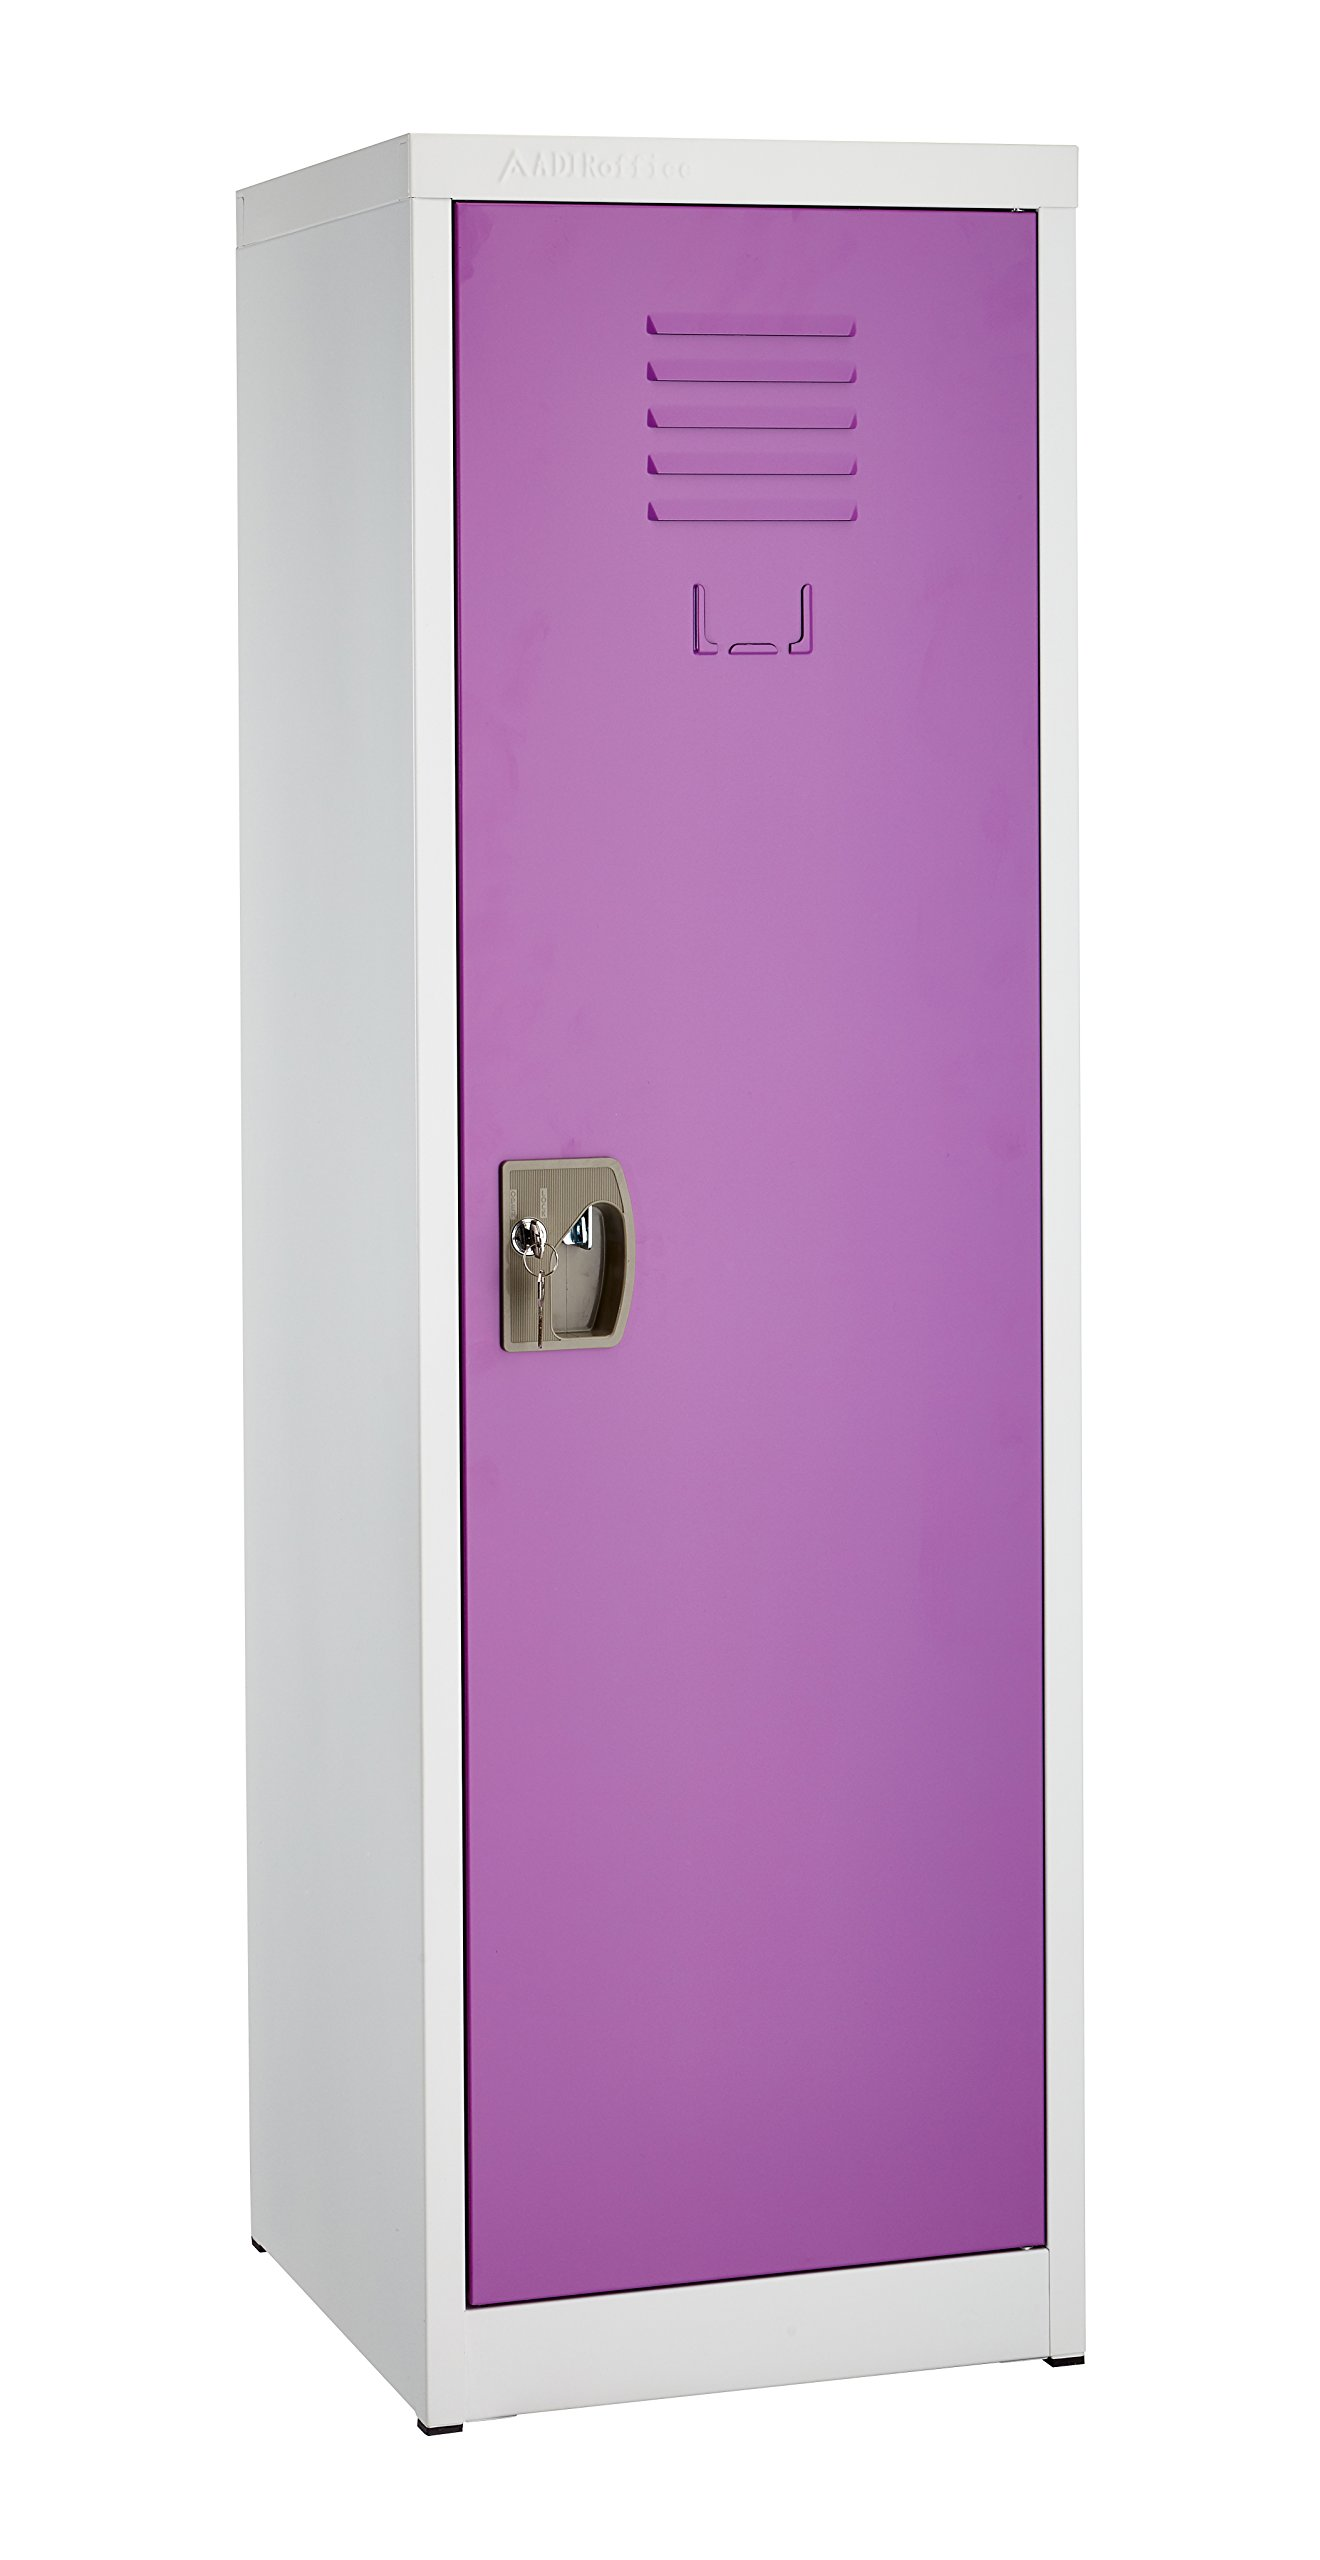 AdirOffice Kids Steel Metal Storage Locker - for Home & School - with Key & Hanging Rods (48 Inch, Purple) by AdirOffice